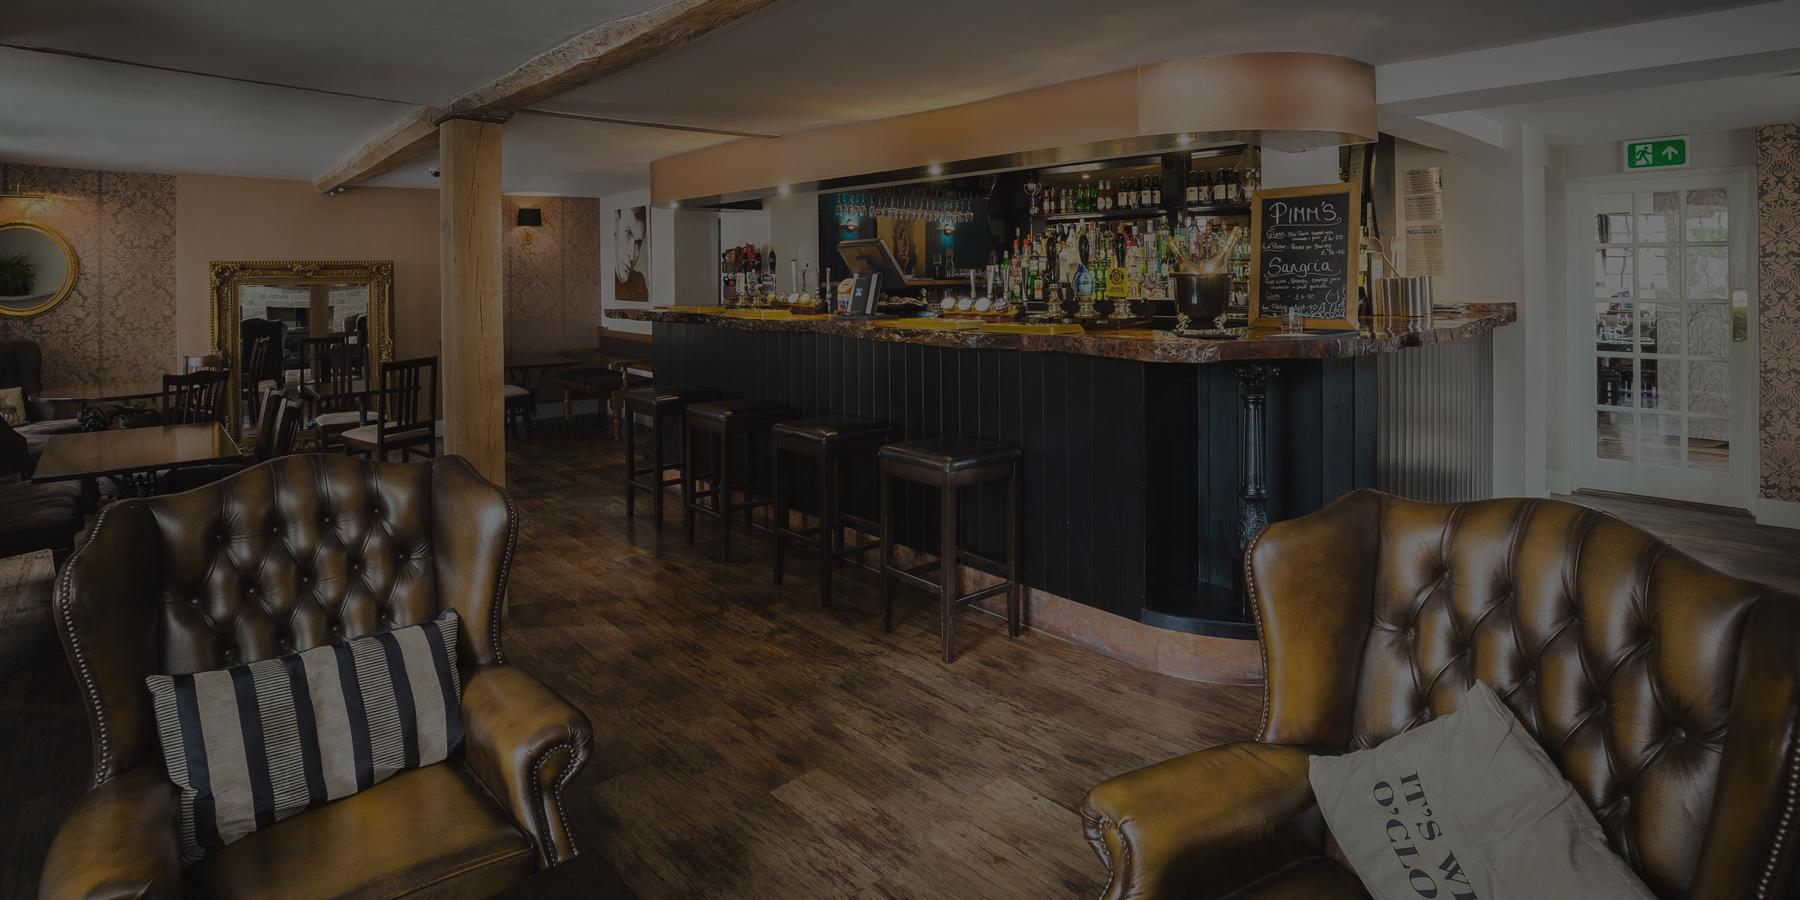 Dutchess Pub Fenstanton